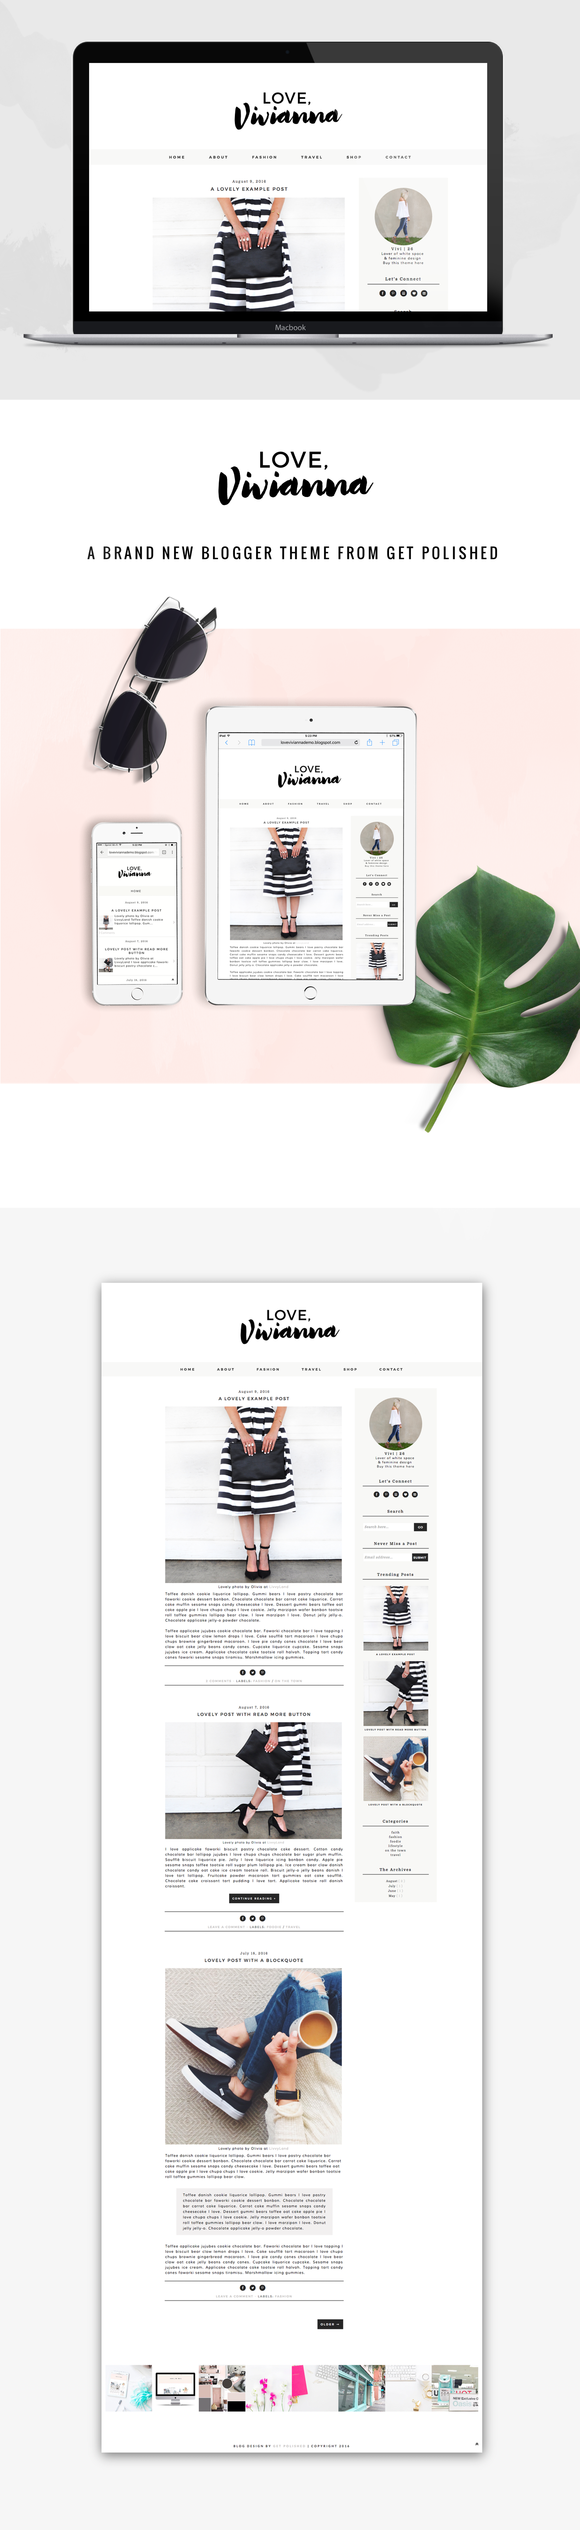 Blogger Template Love Vivianna - Themes